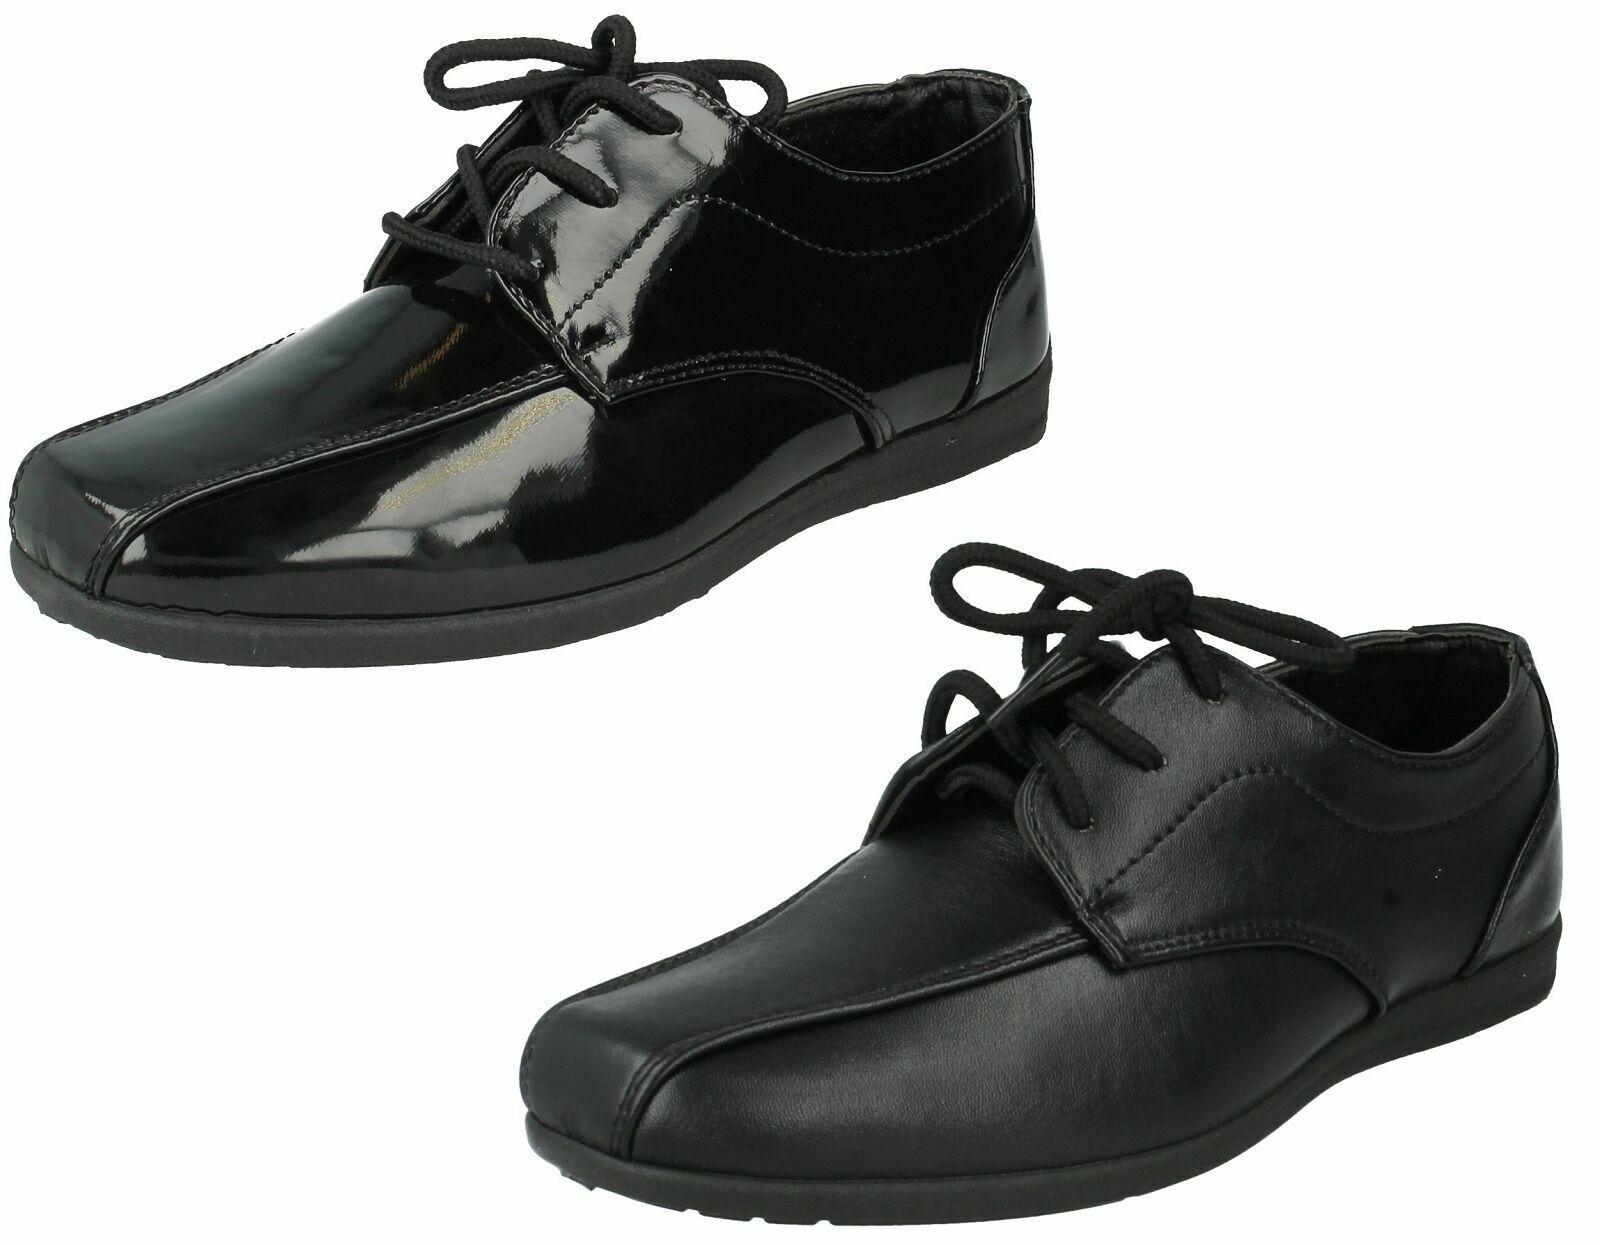 Boys JCDEES Black Lace Up Smart School Shoes UK Sizes 10 - 4 : N1110